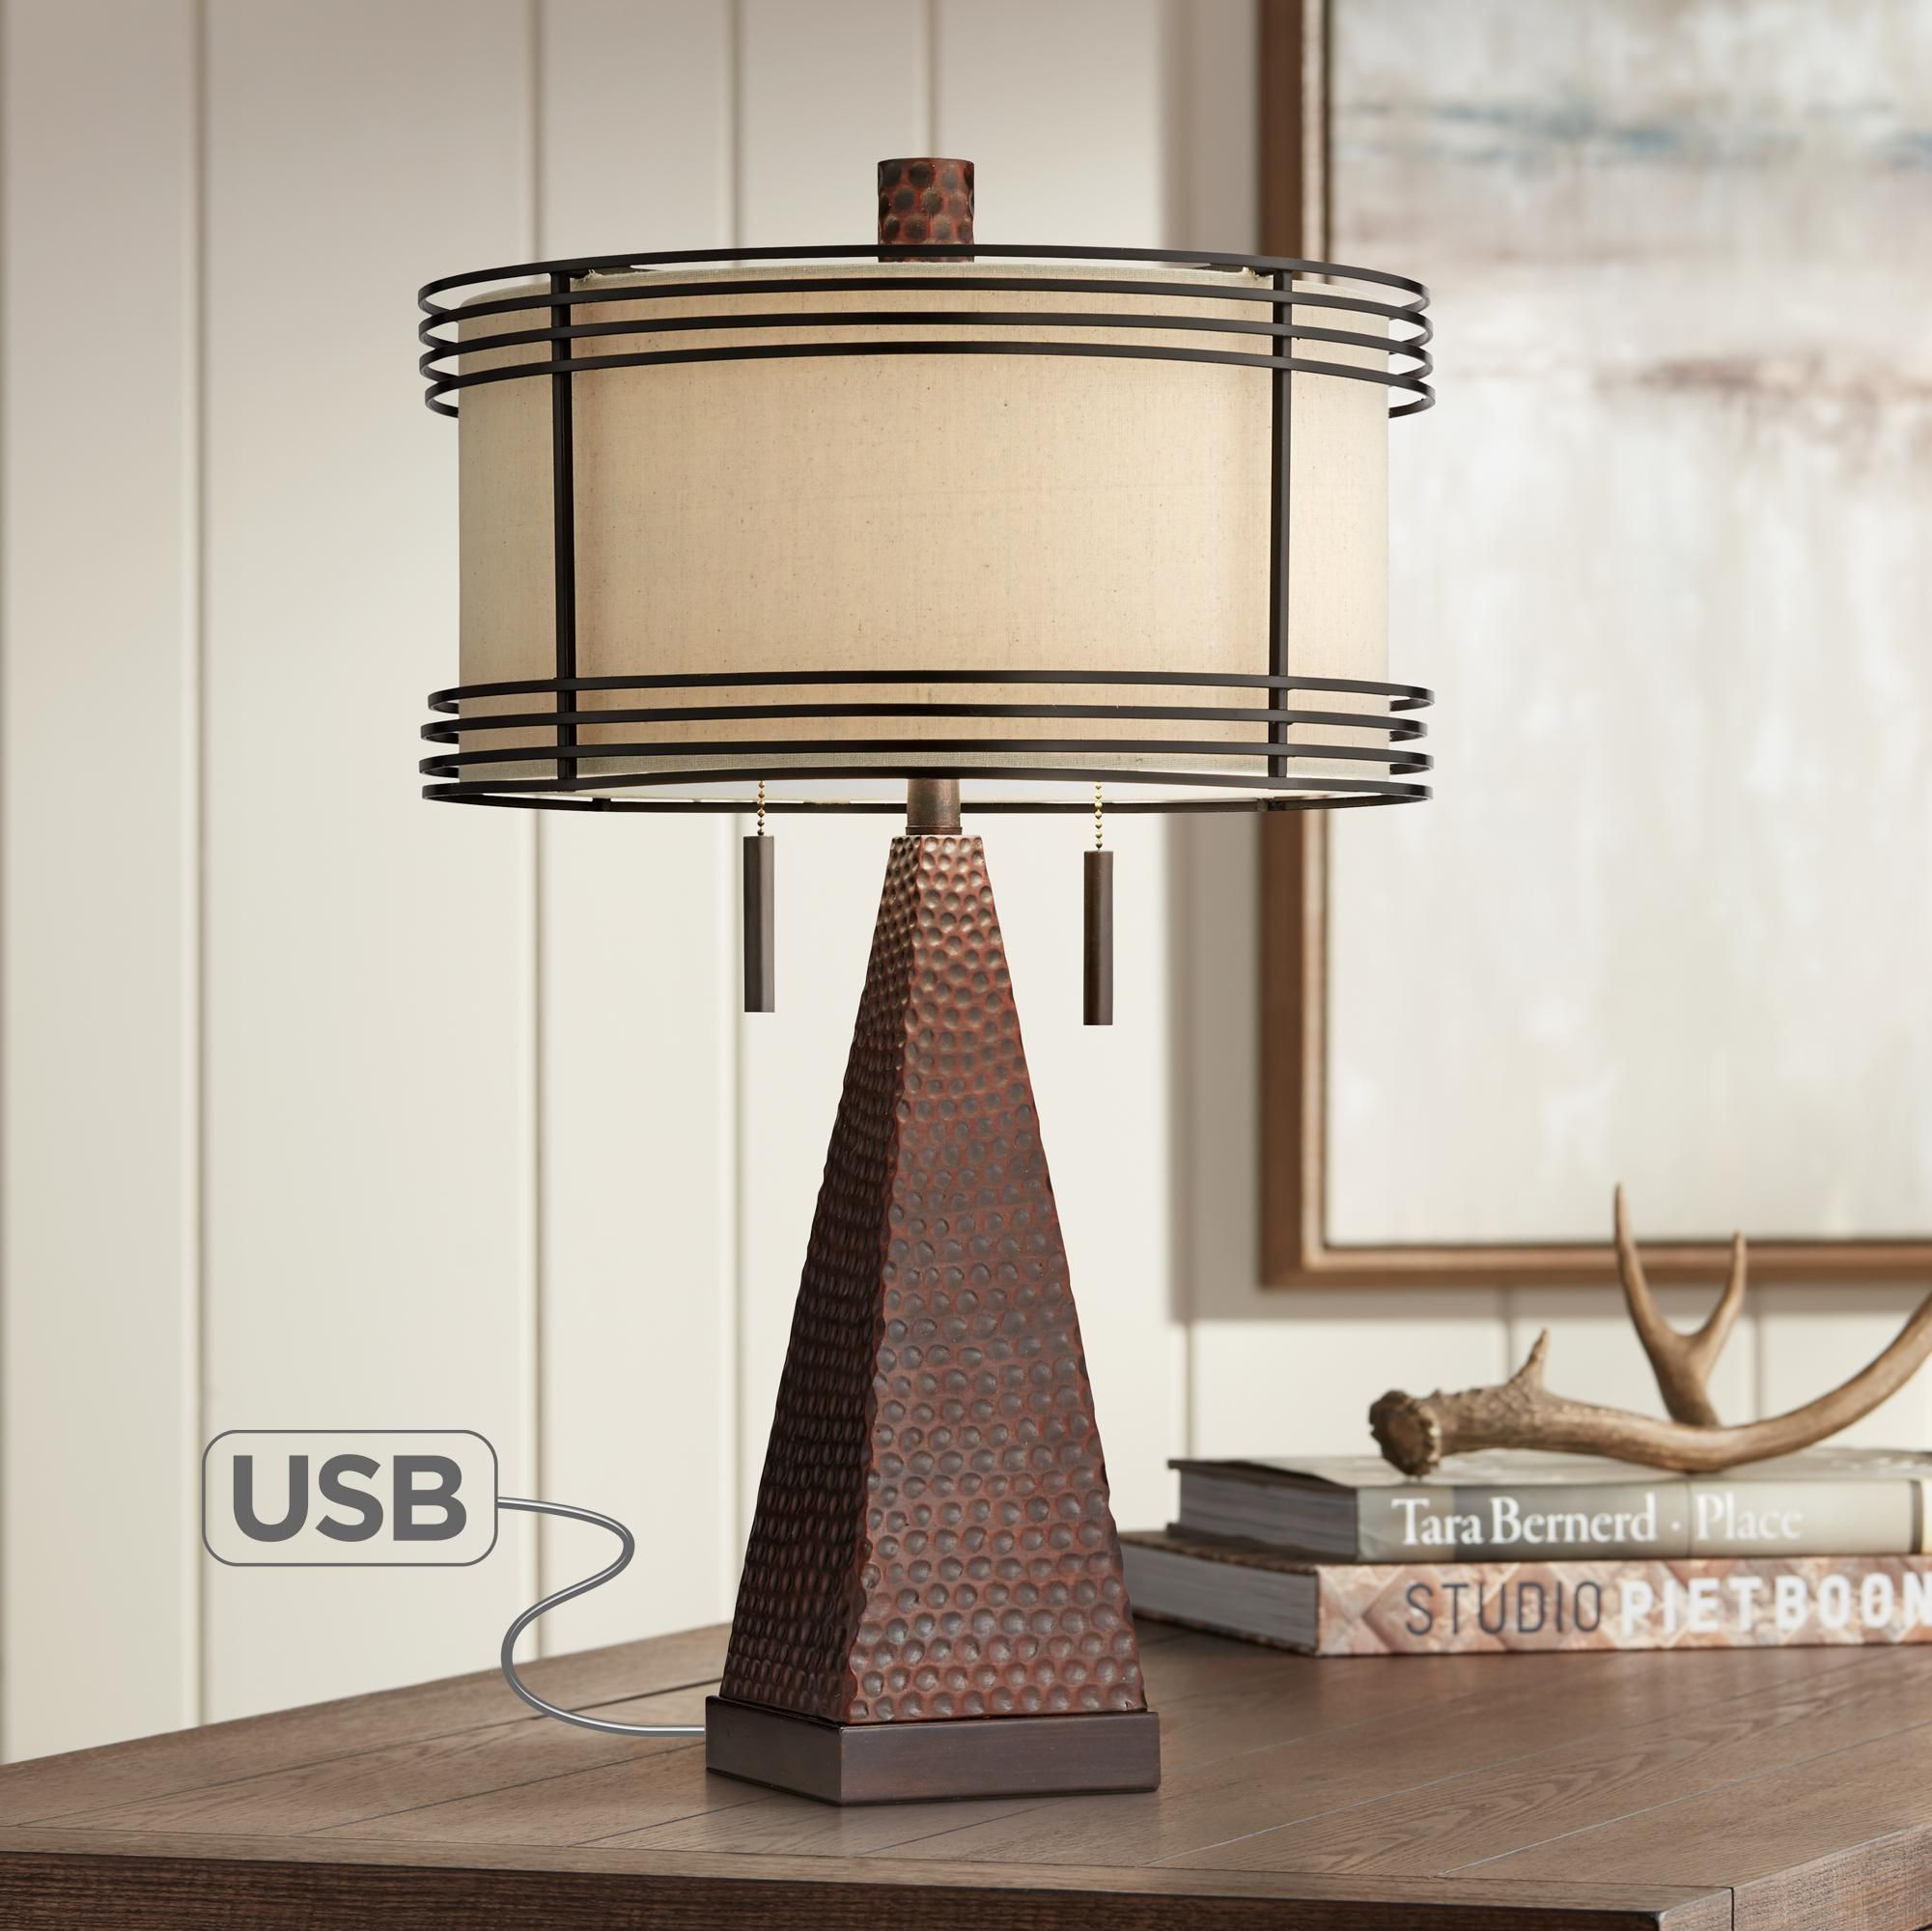 Table Lamps Niklas Industrial Bronze Table Lamp With Usb Port Bronze Table Lamp Industrial Table Lamp Rustic Table Lamps